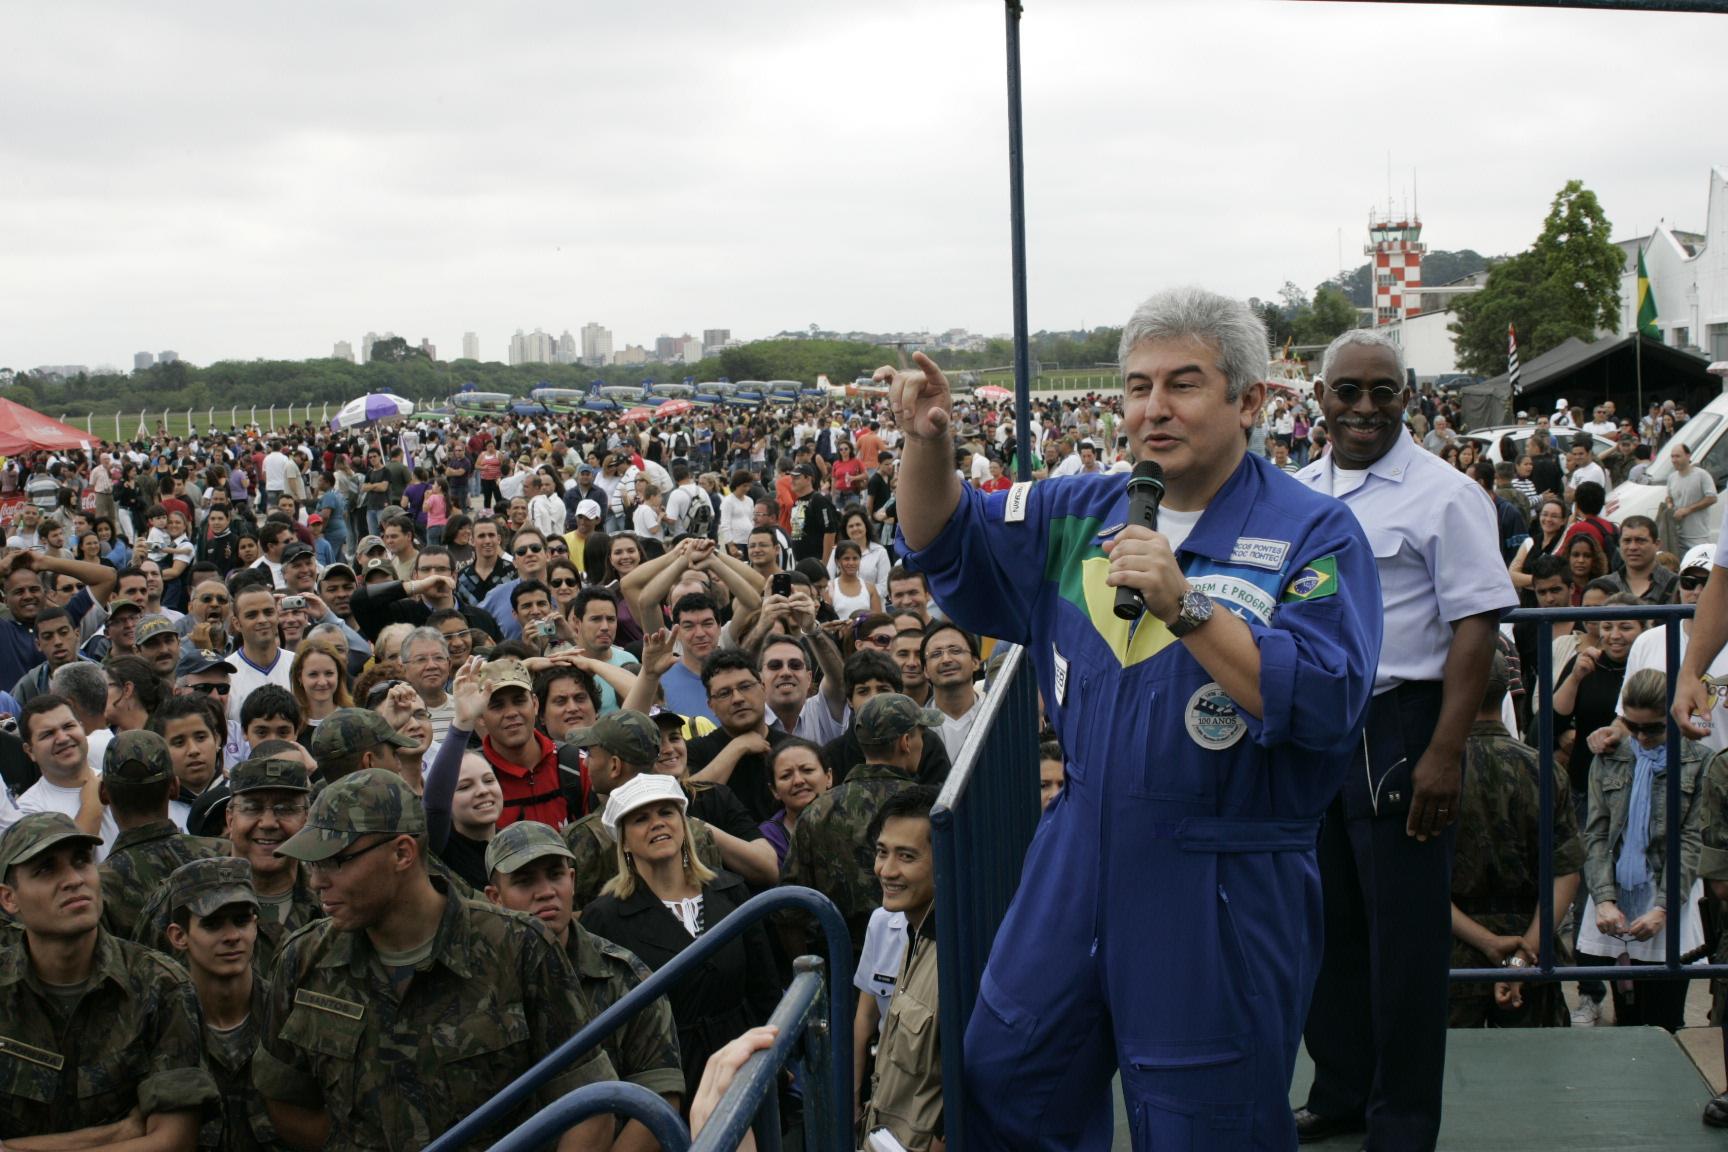 http://www.fab.mil.br/sis/enoticias/imagens/original/7139/astronauta2.jpg